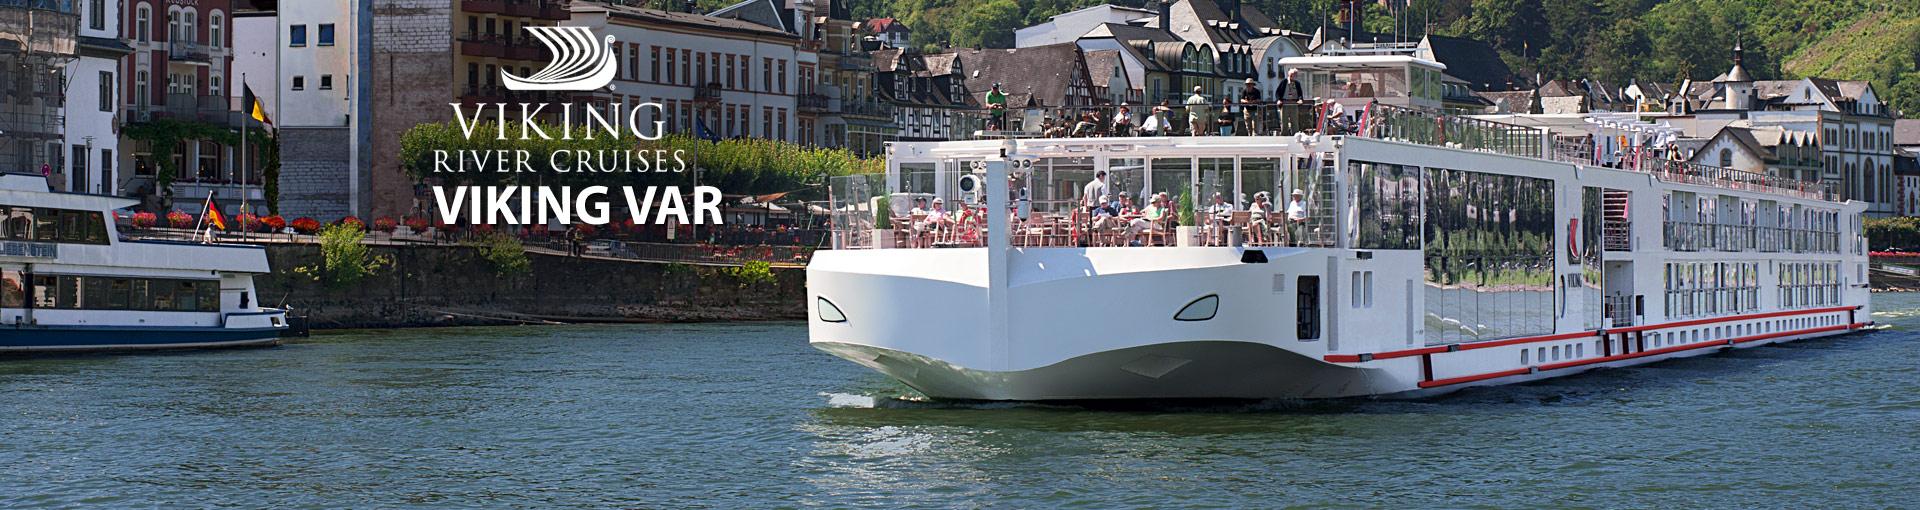 Viking Rivers Viking Var river cruise ship